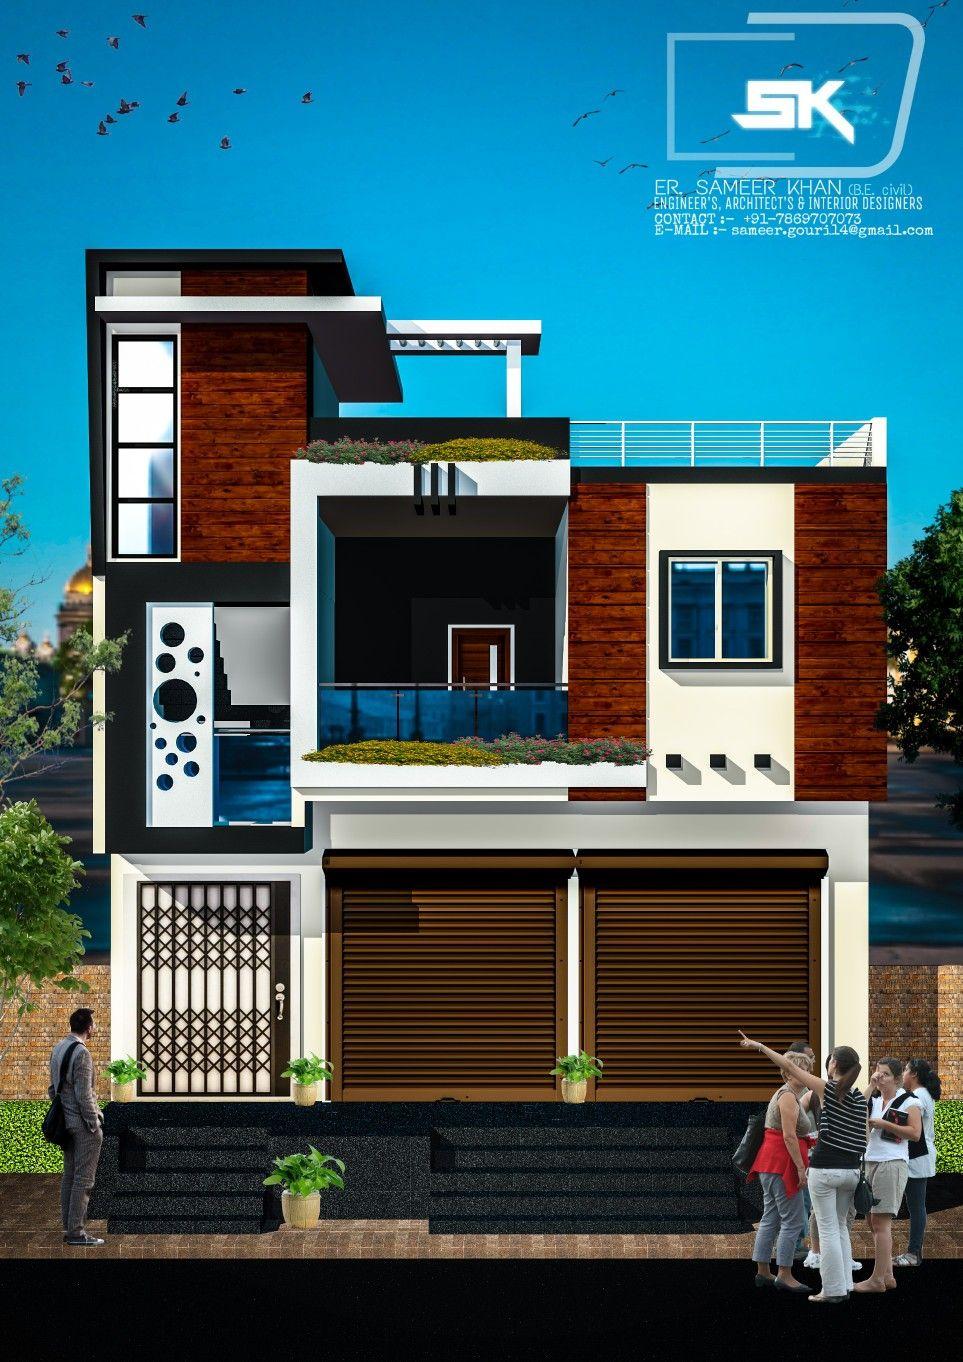 34 Samples Of Modern Houses Most Popular Exterior Design: Introducing Modern House Trending Exterior Elevation With Shop By Er. Sameer Khan #modernhouse